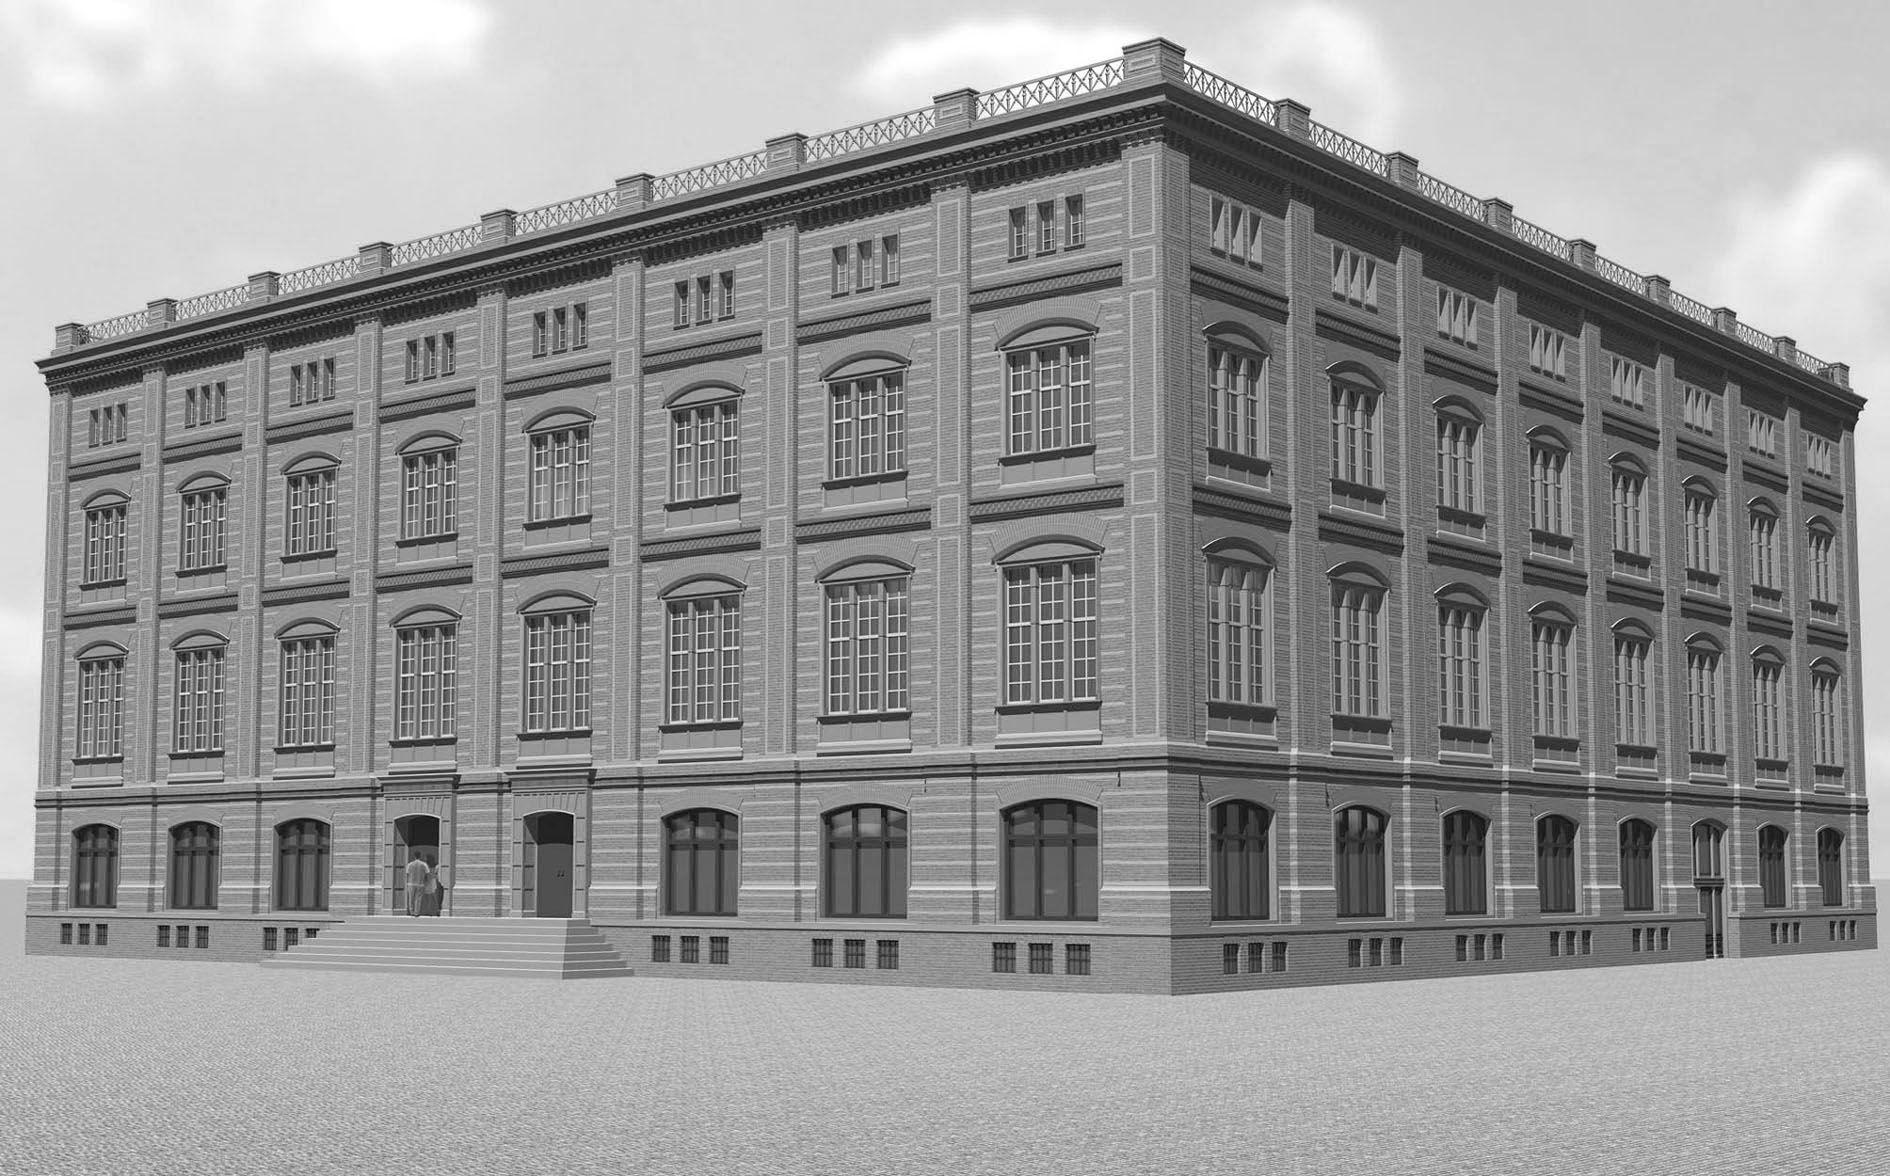 Karl Friedrich Schinkel Bauakademie Berlin 1831 6